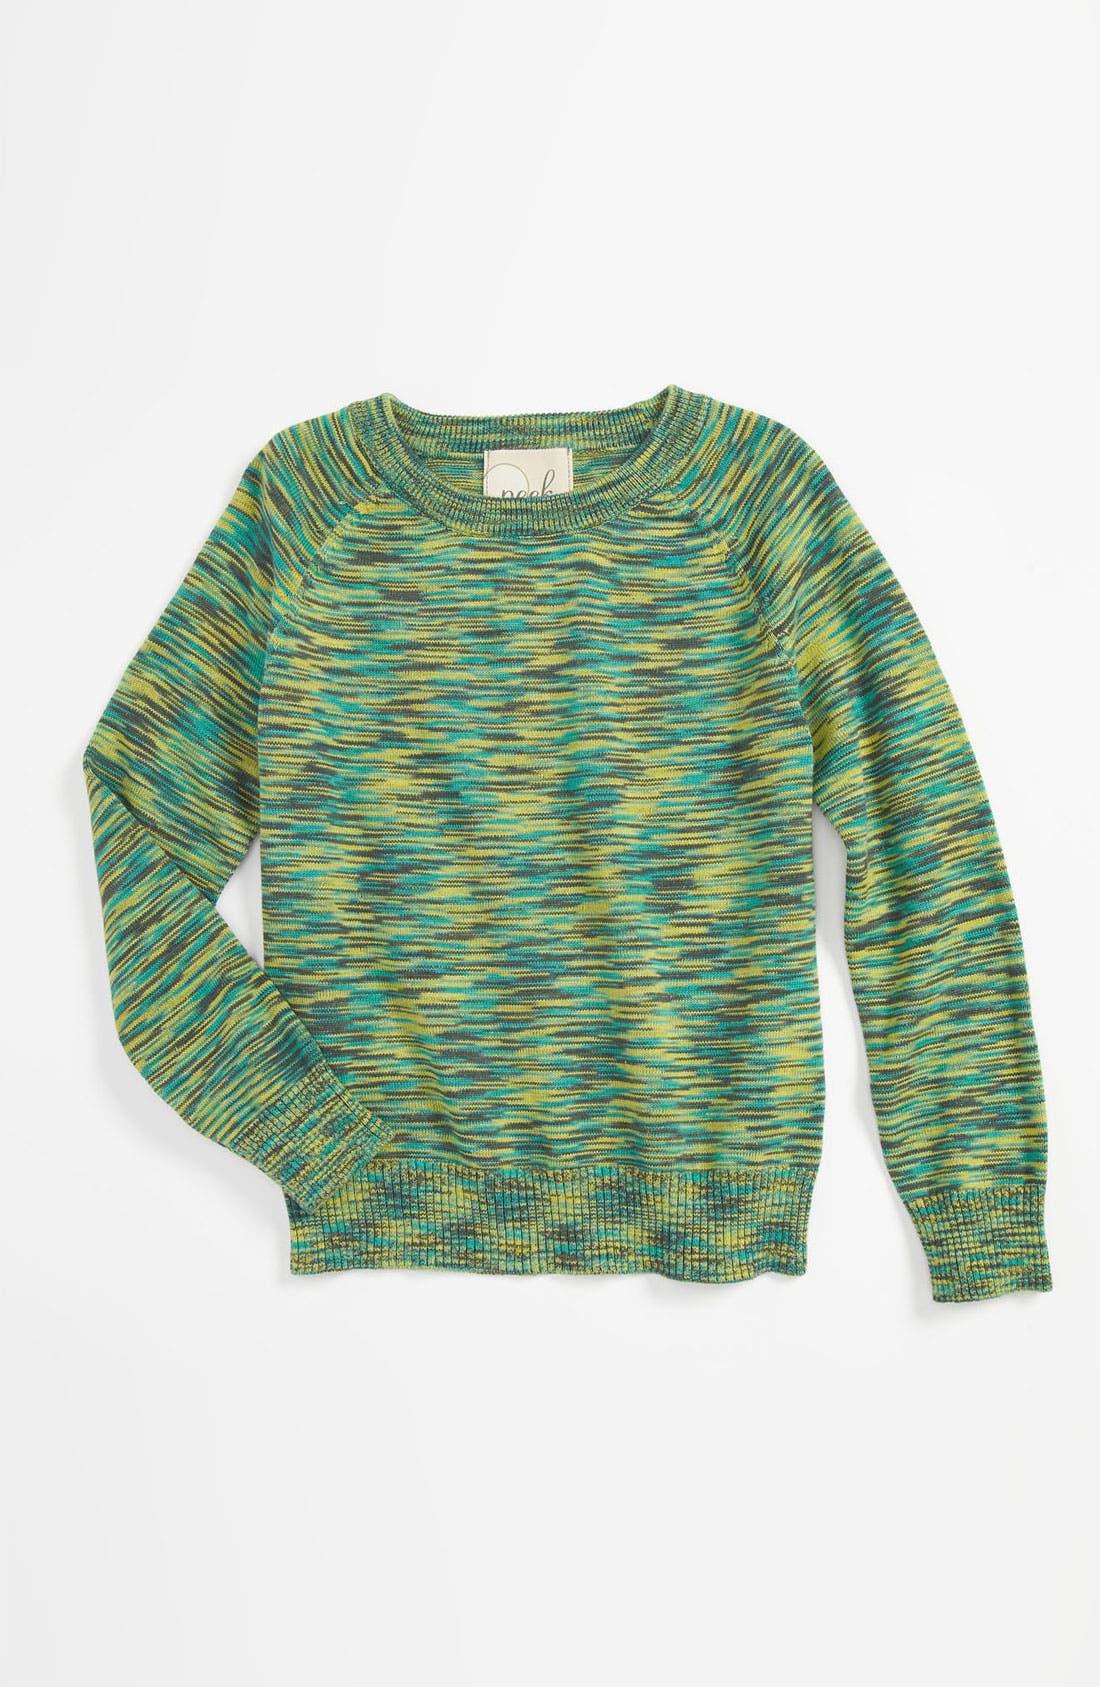 Alternate Image 1 Selected - Peek 'Susana' Crewneck Sweater (Toddler, Little Girls & Big Girls)